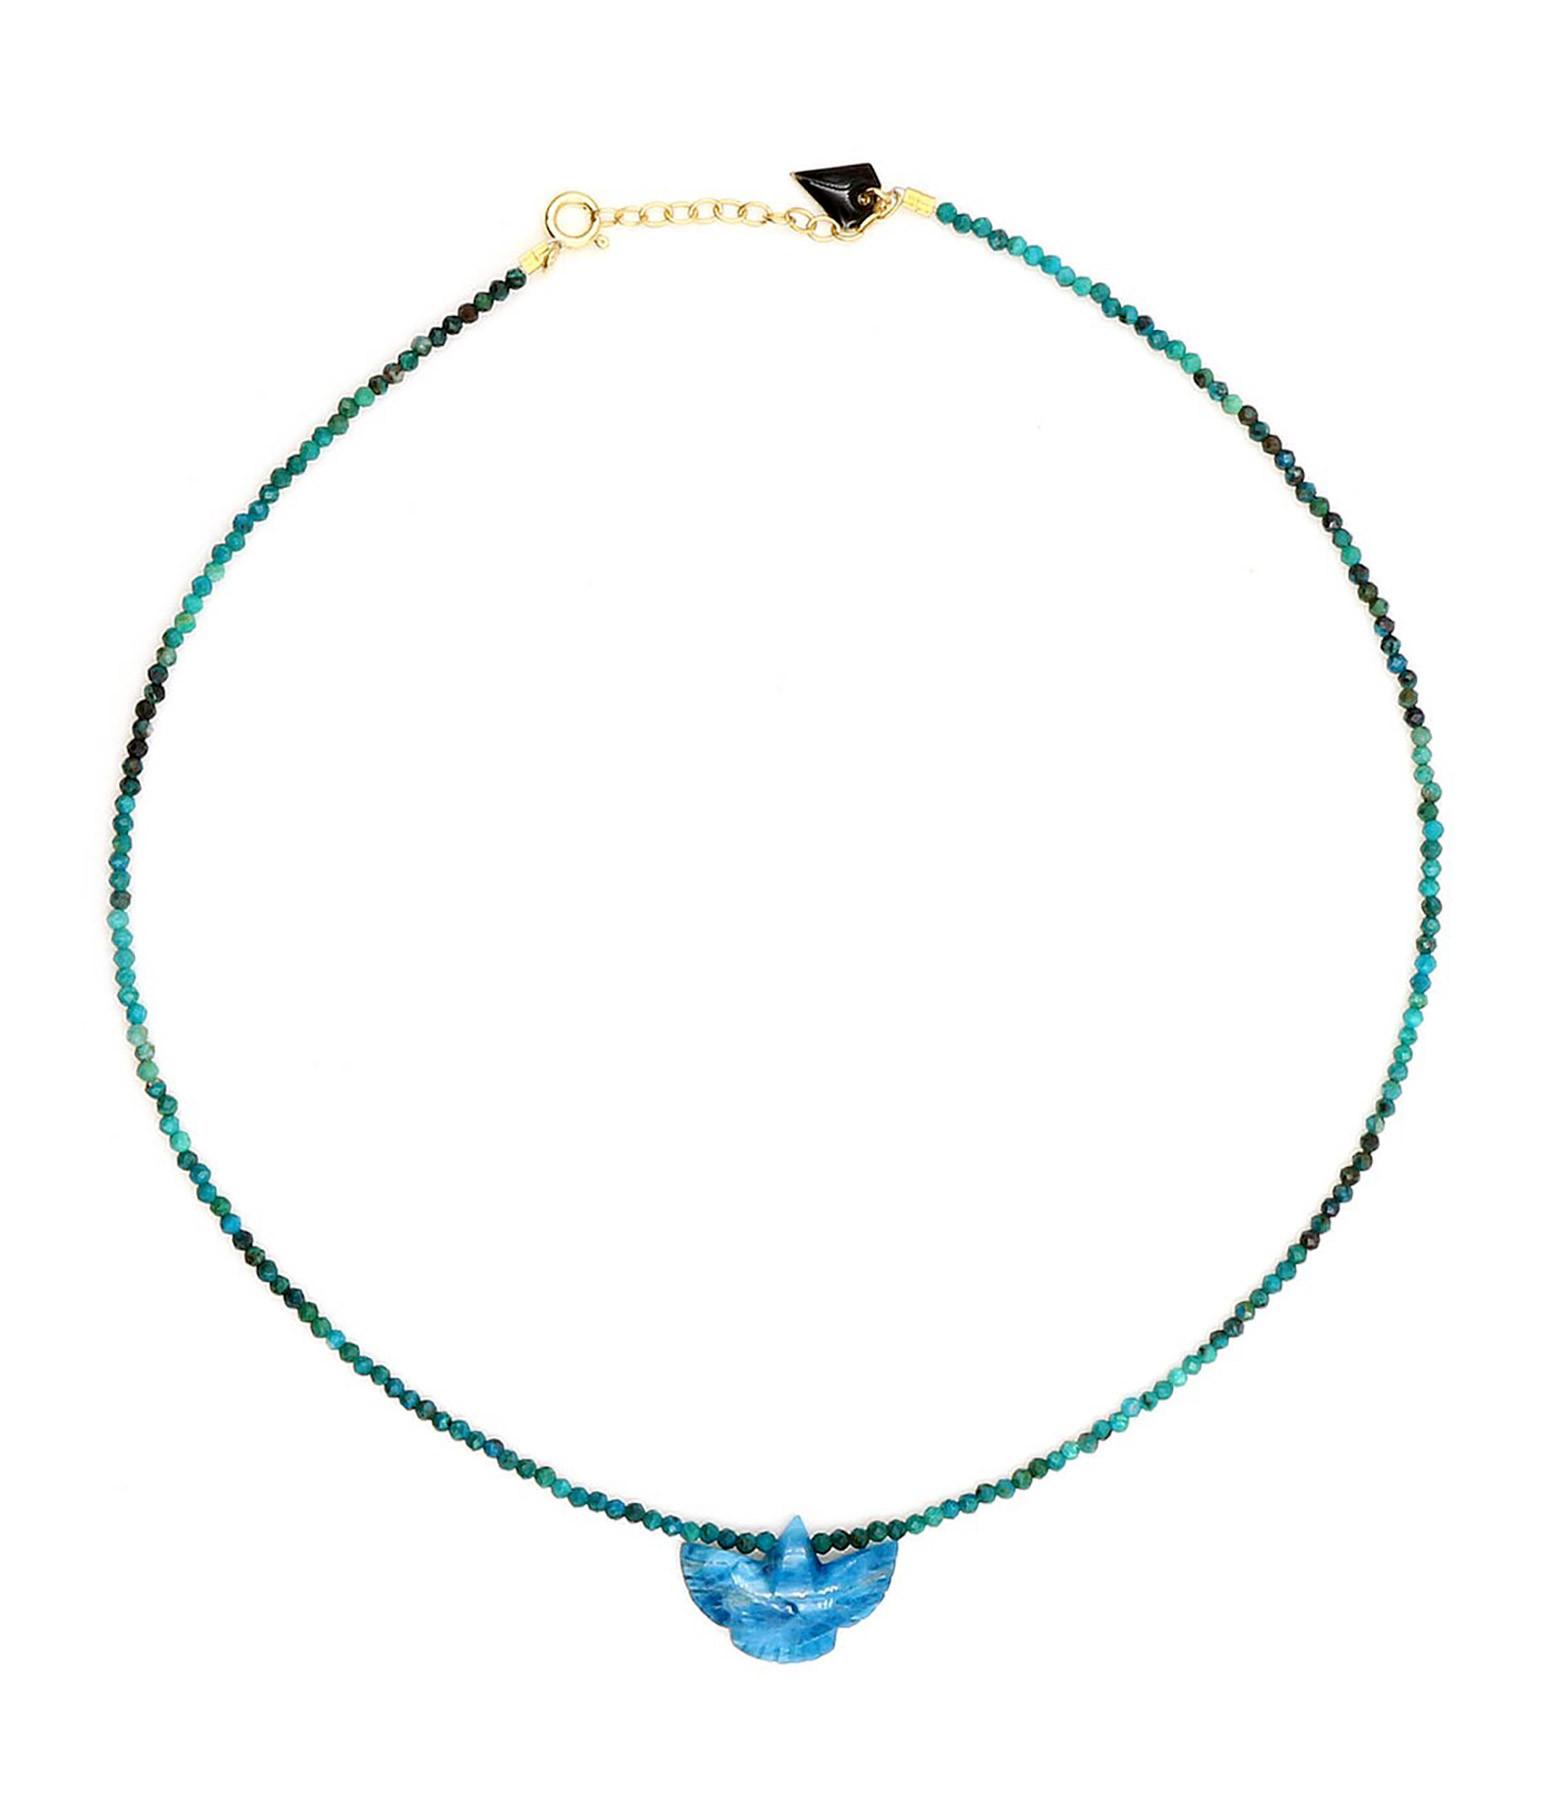 MON PRECIEUX GEM - Collier Condor Turquoise Apatite